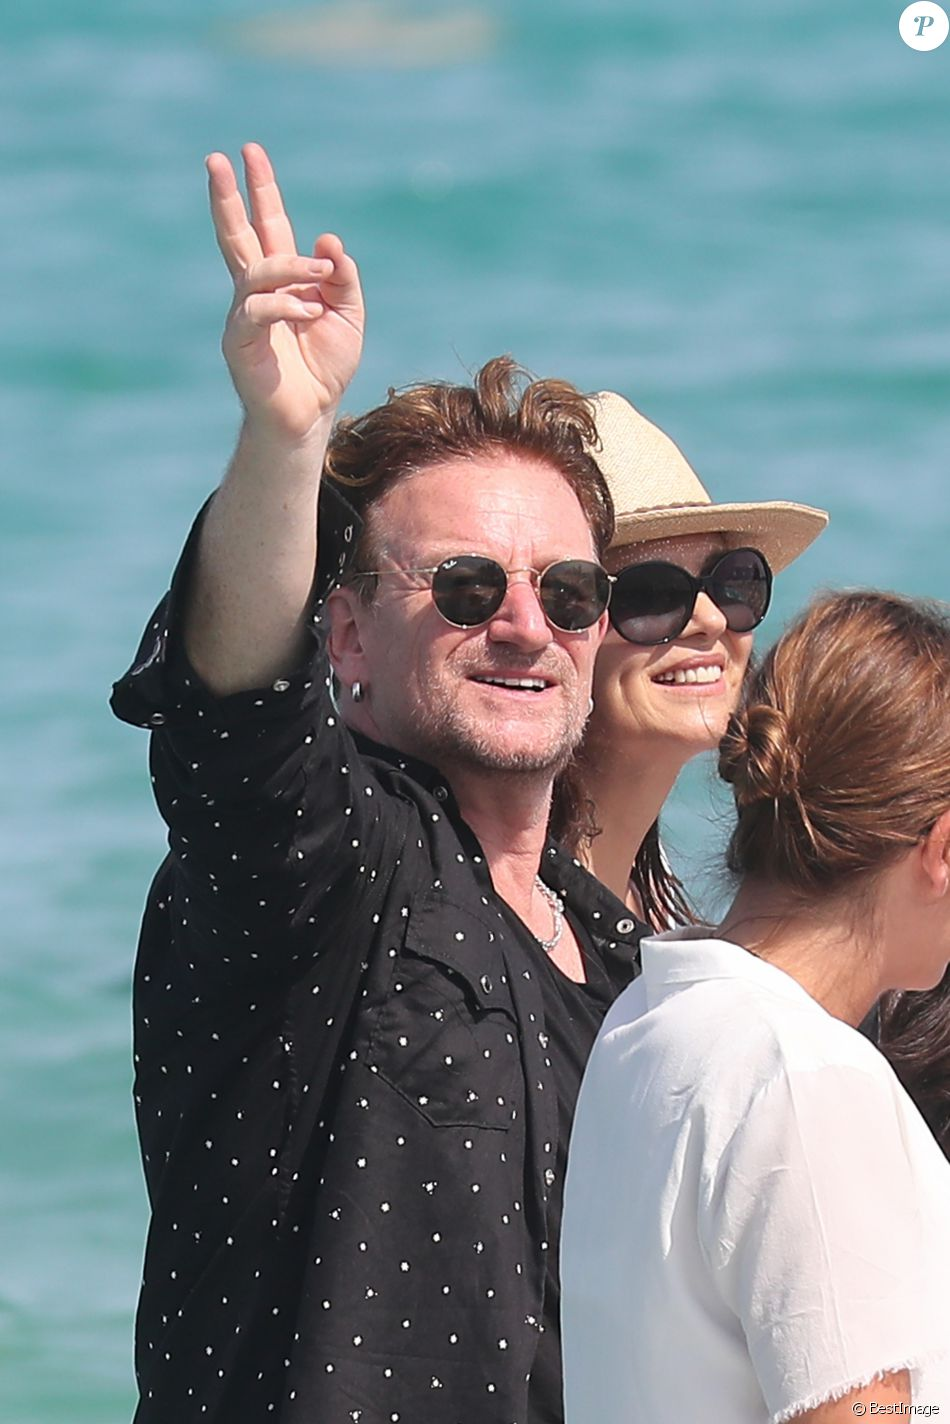 U2's frontman Bono